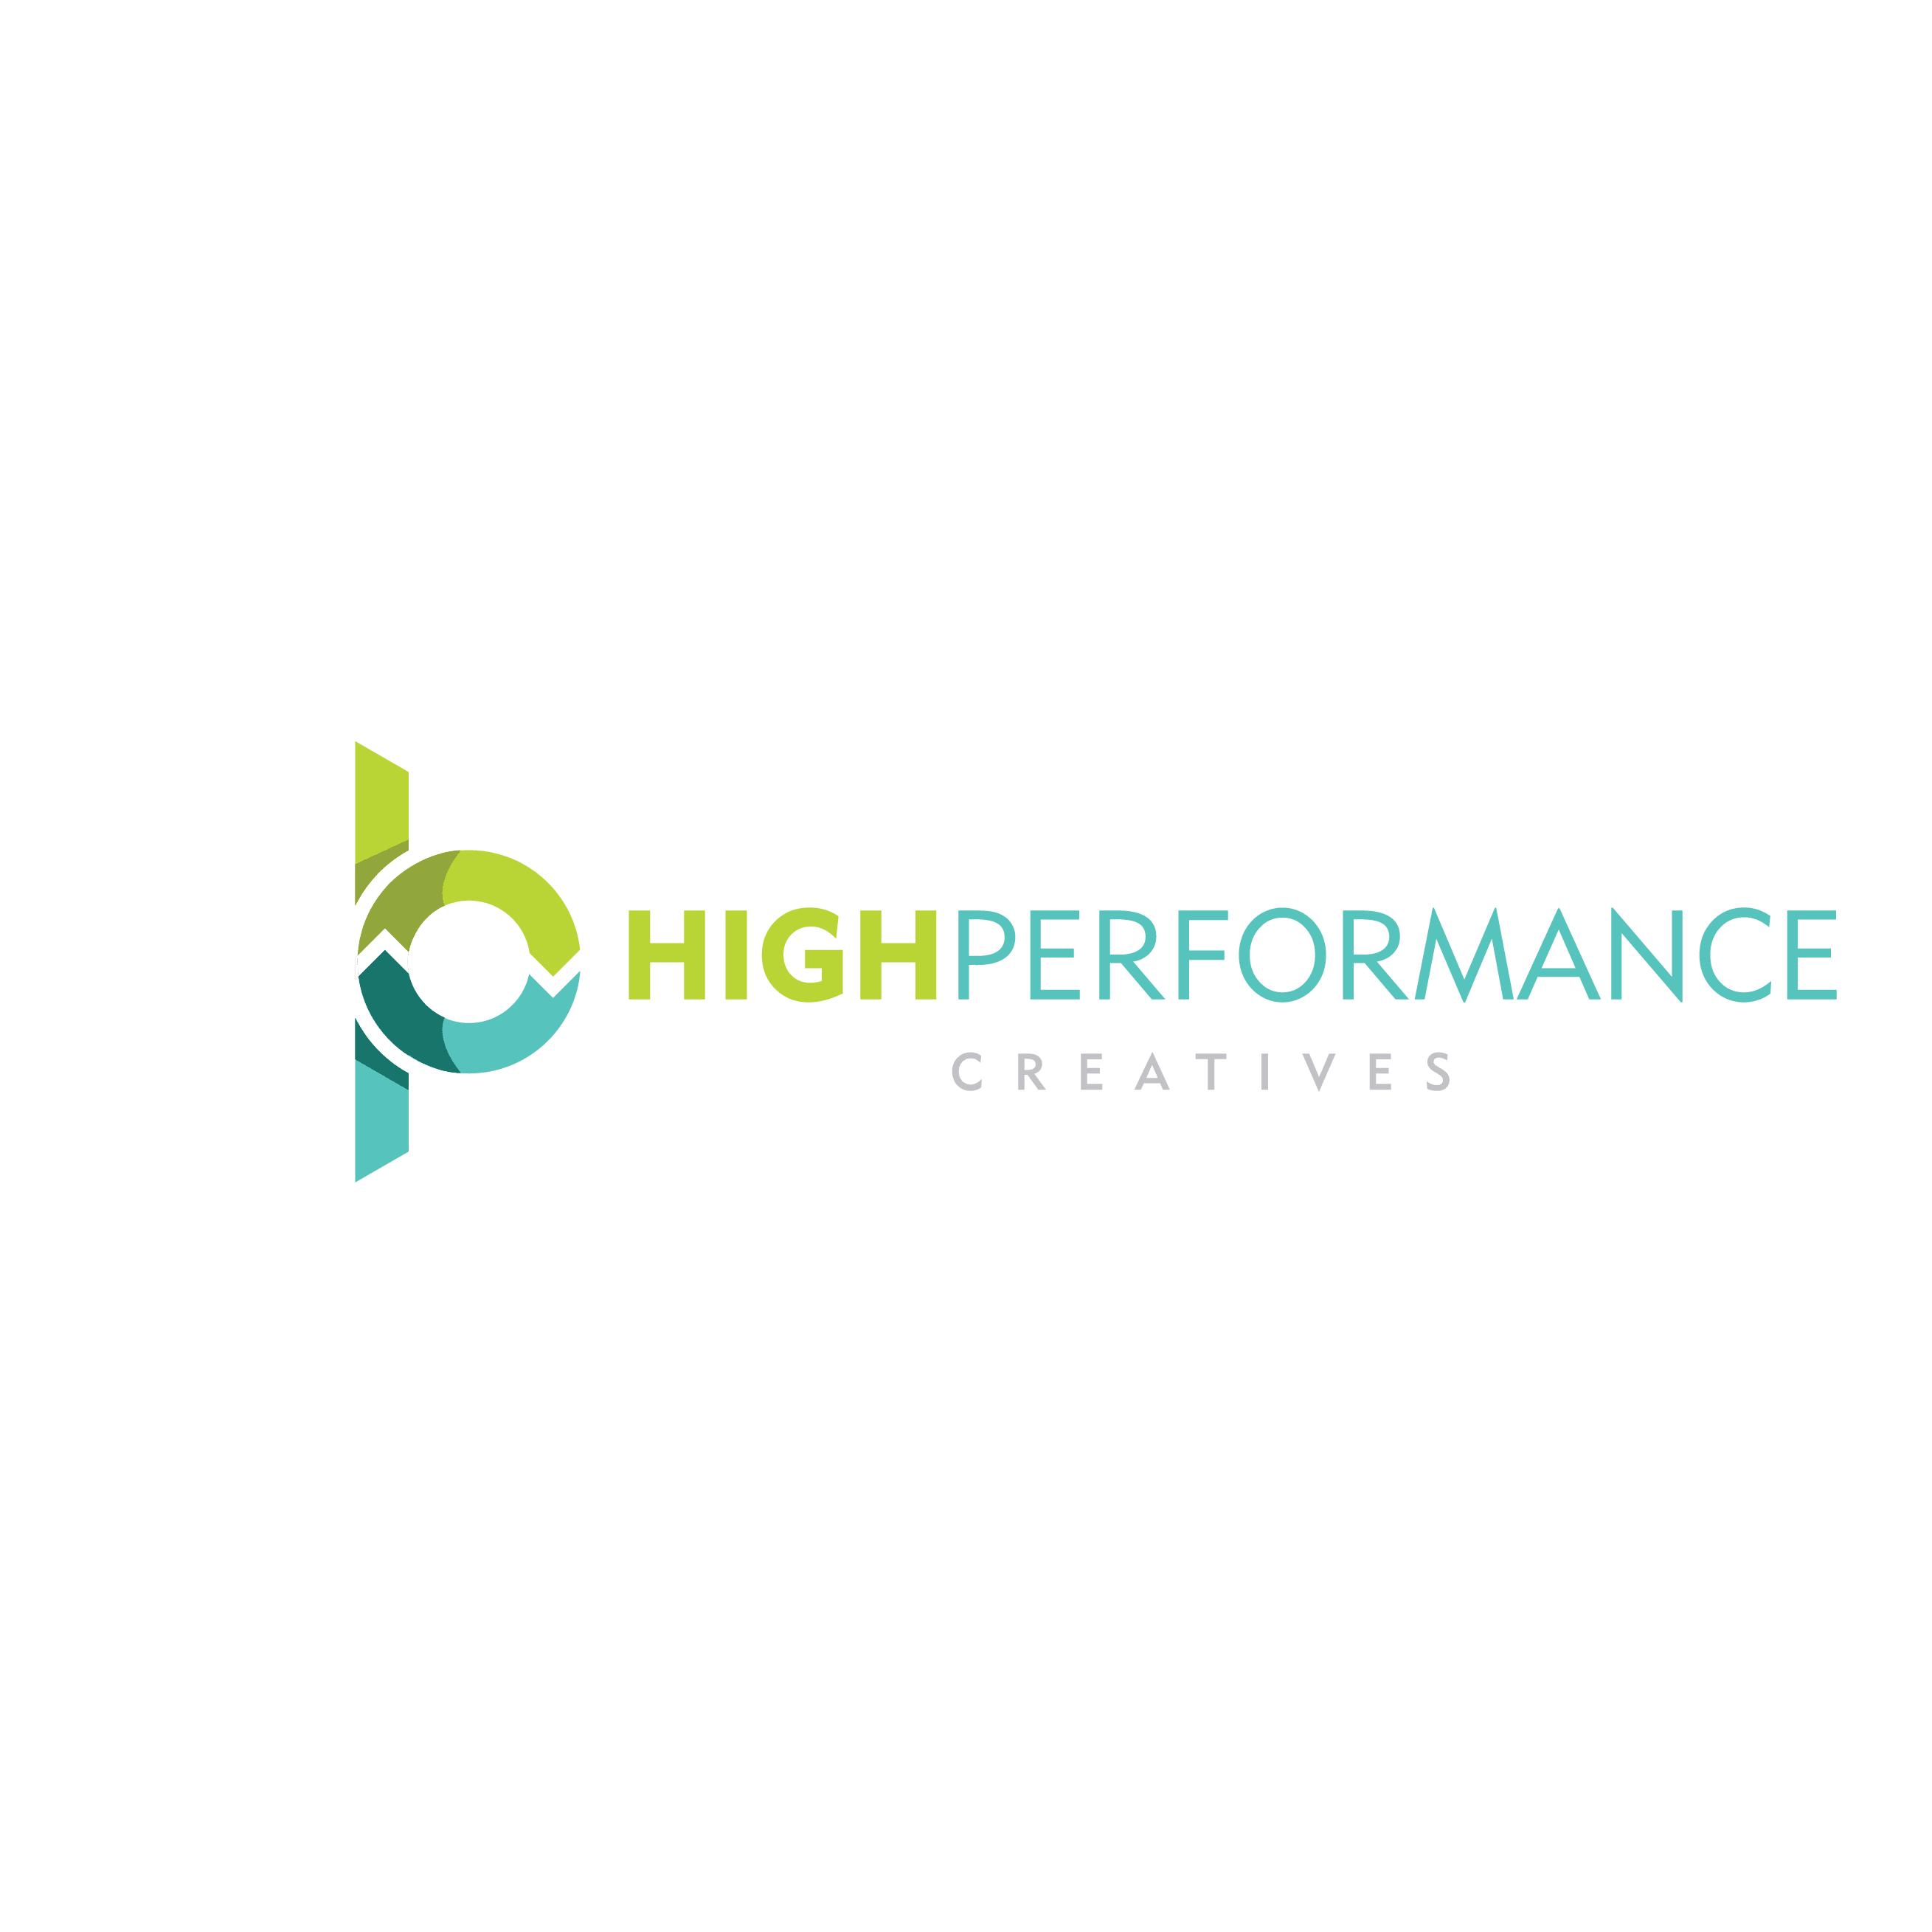 High Performance Creatives